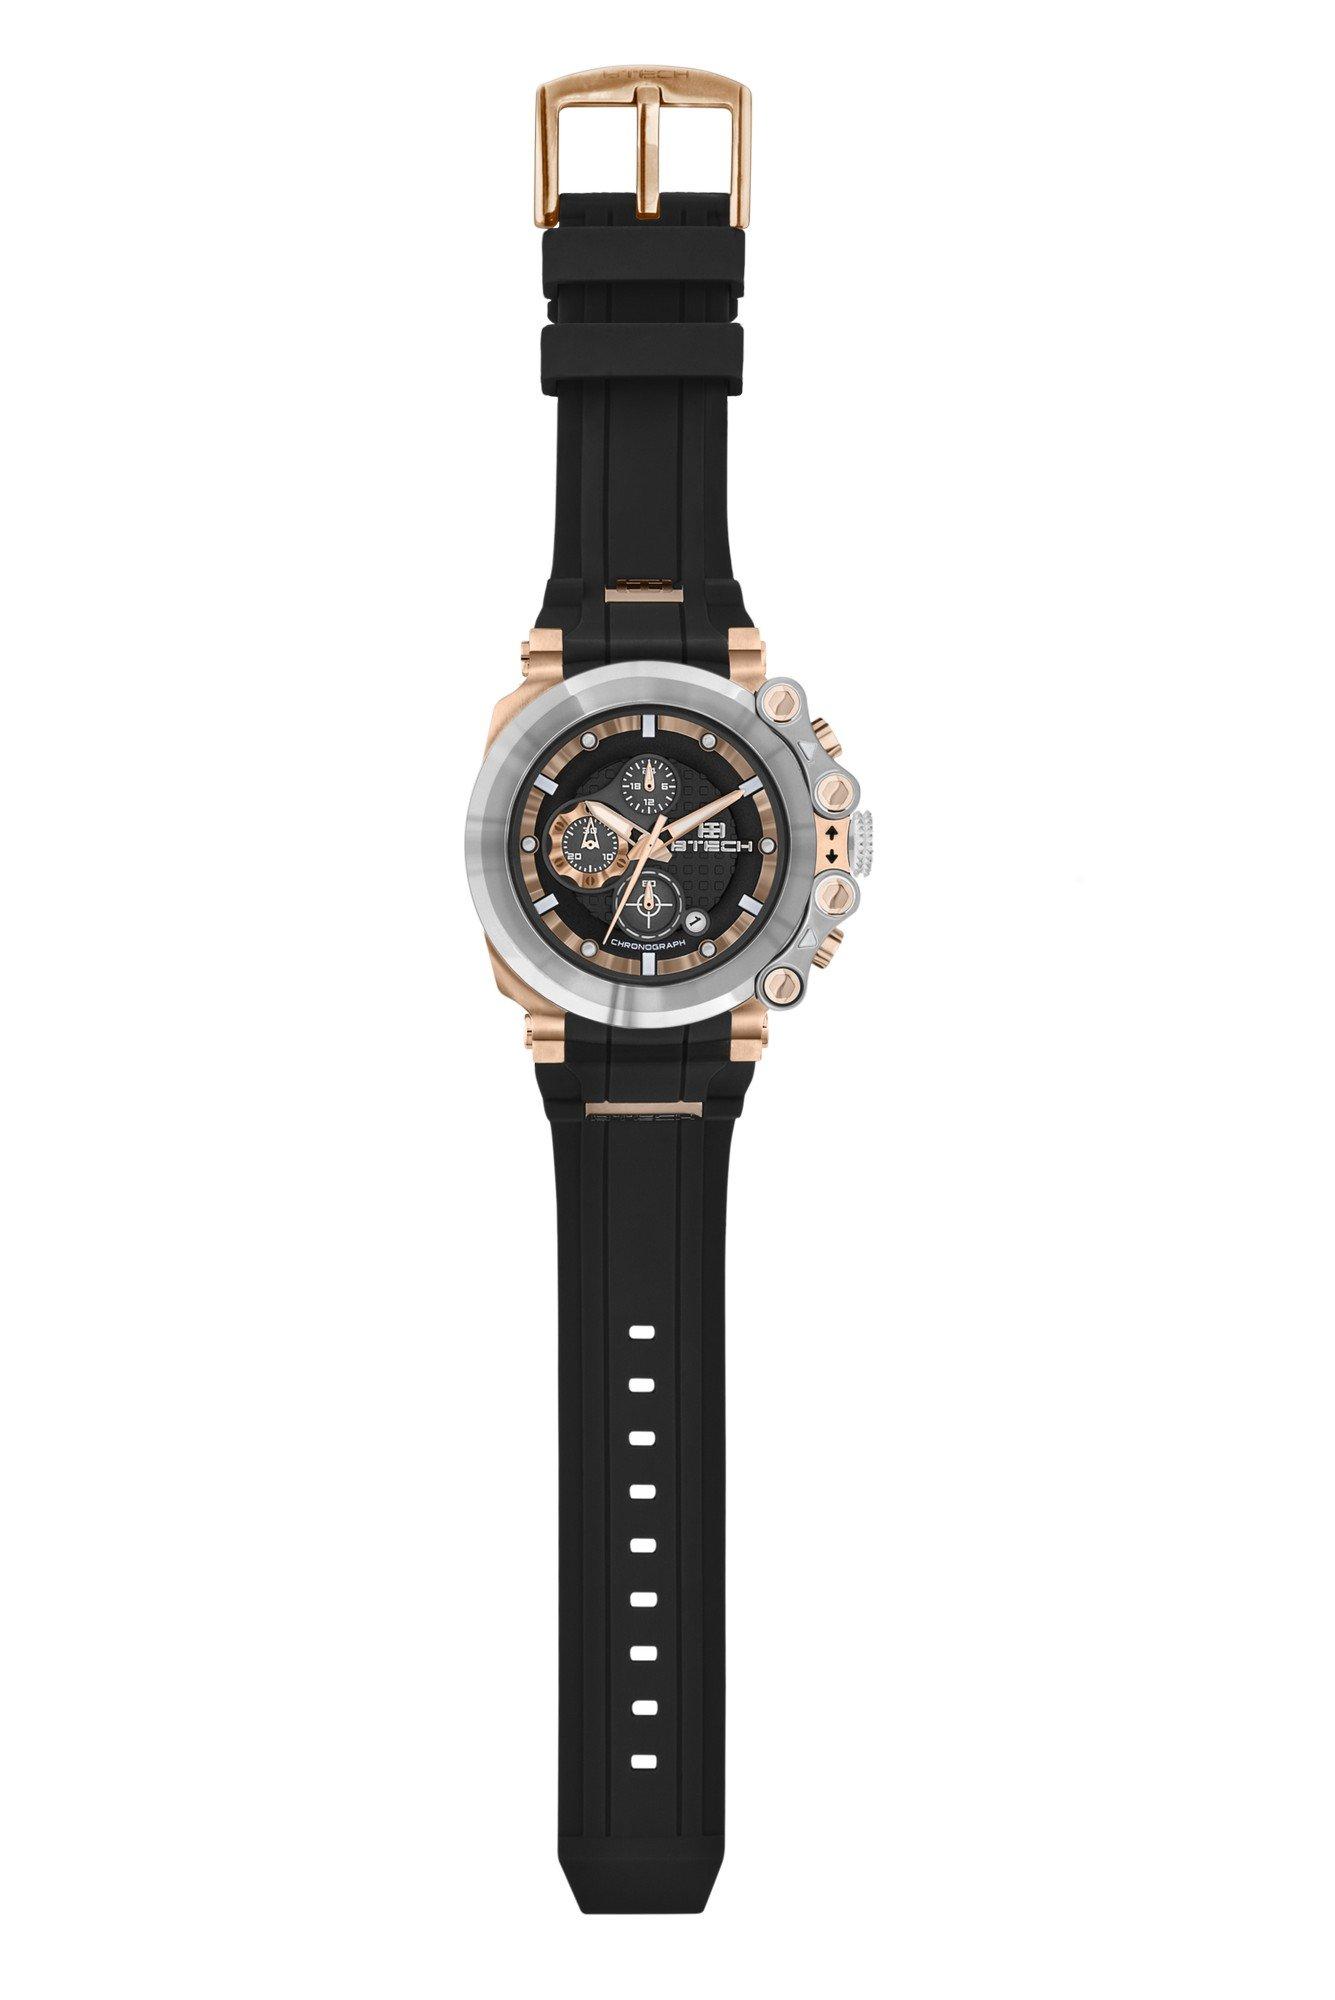 BTECH Unisex BT-CC-331-02 Cite Analog Chronograph Casual Wrist Watch Black Silicon Strap Band